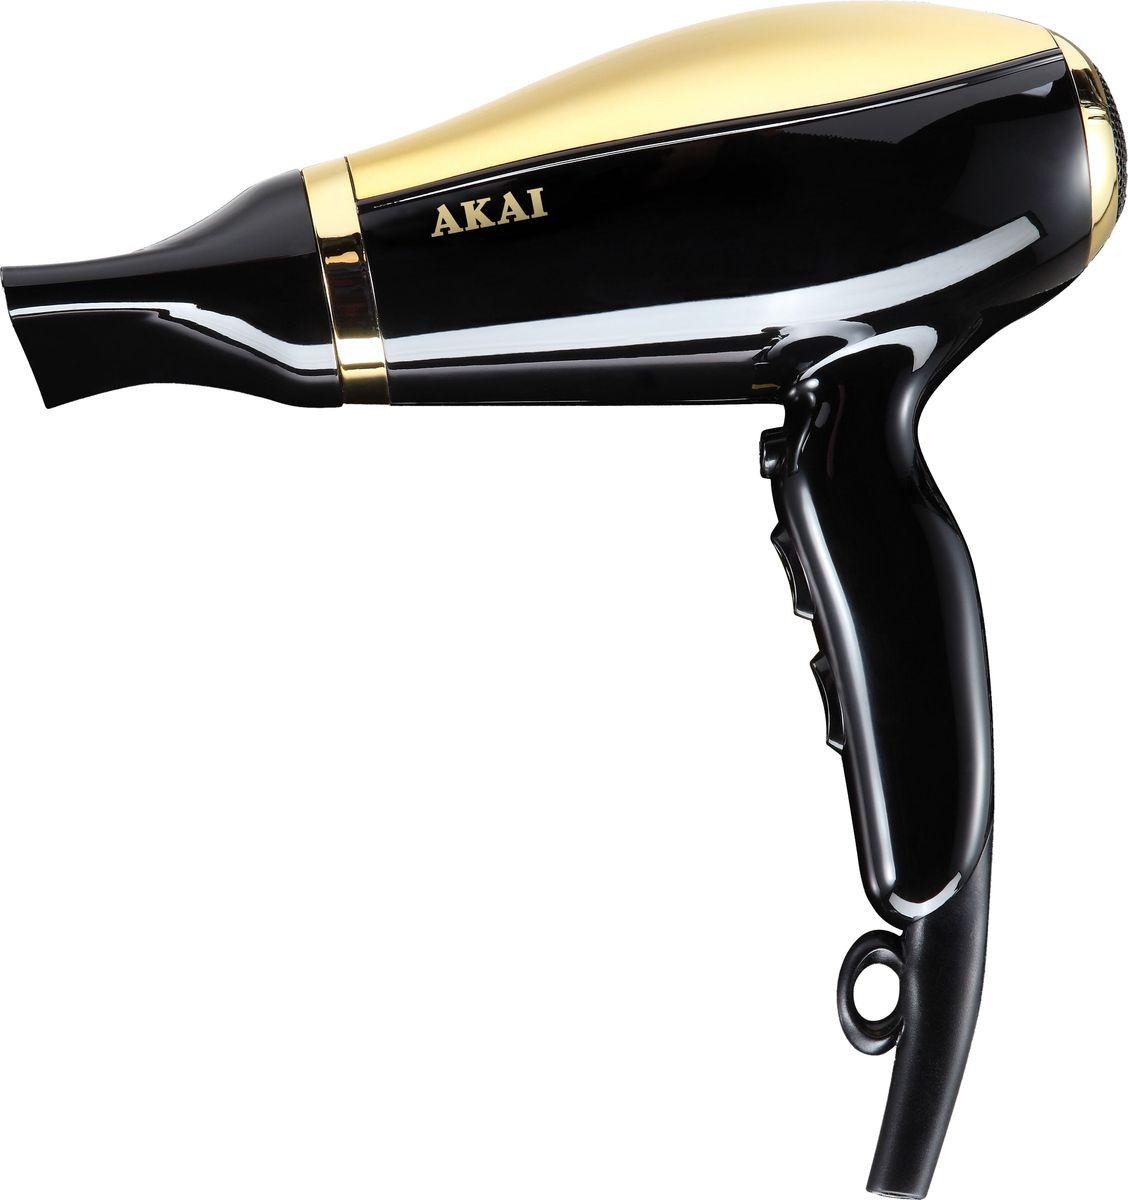 Akai HD 1703 В, Black Gold фен akai hd 151r